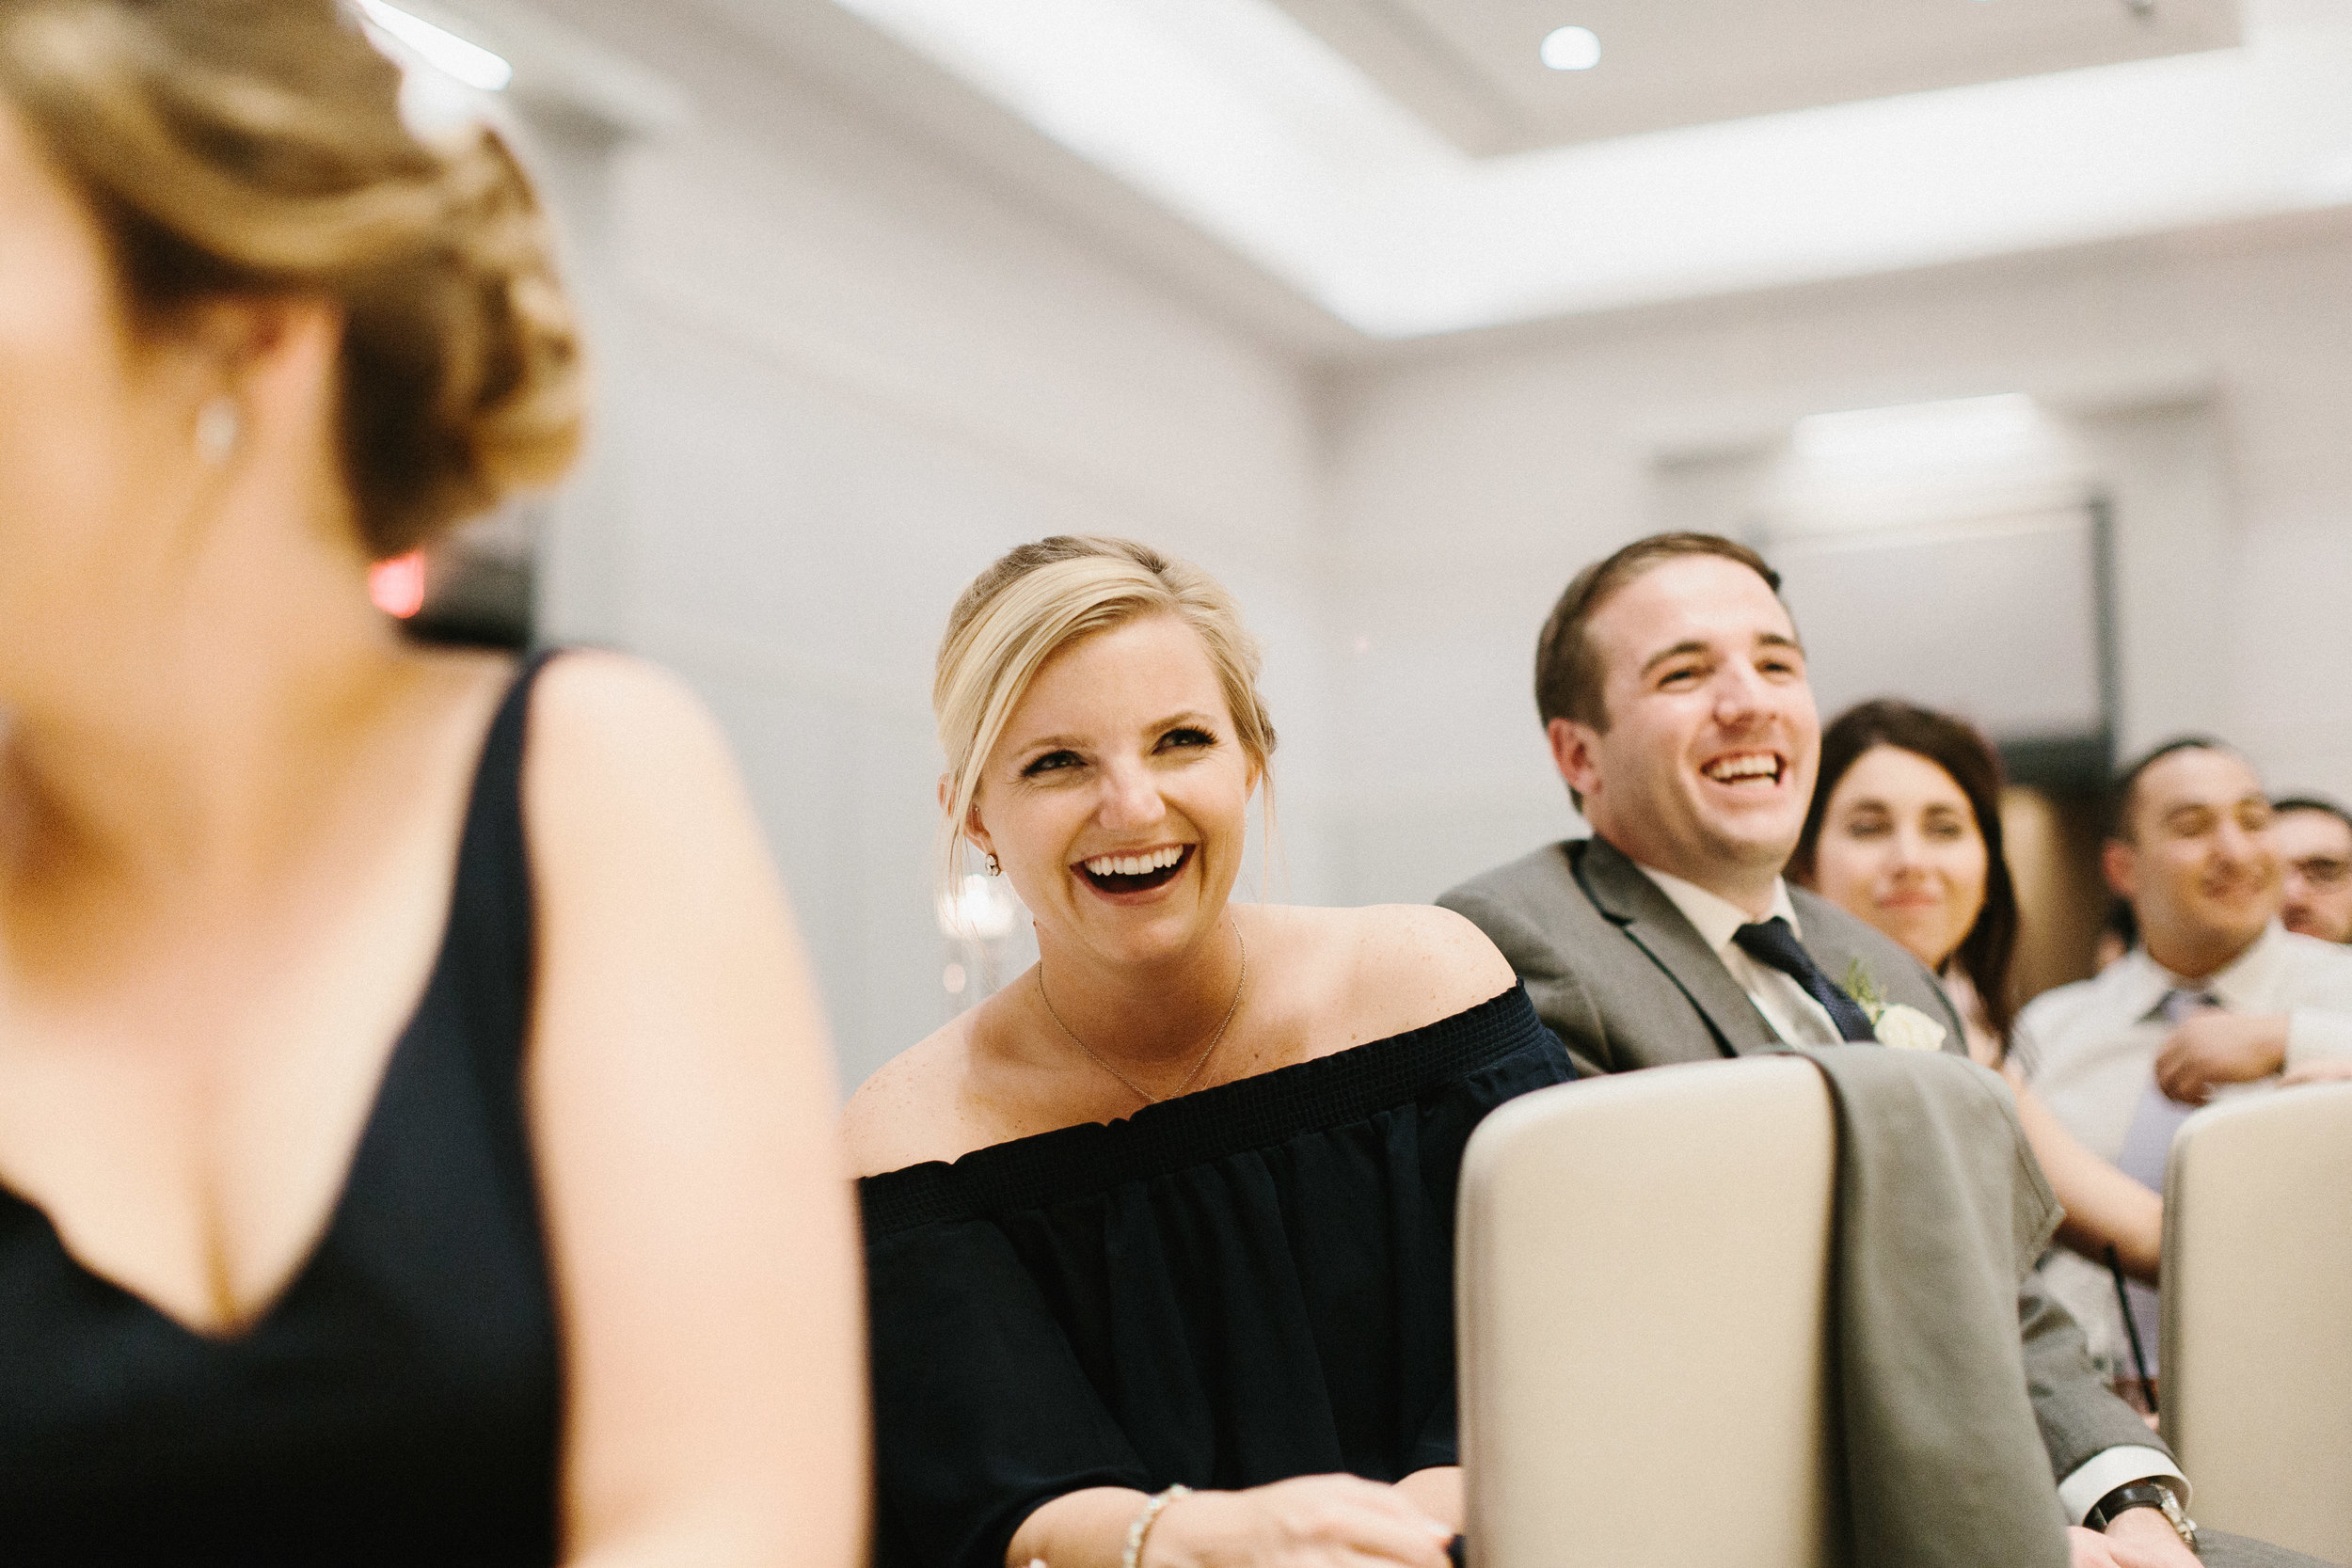 roswell_st_peter_chanel_catholic_avalon_hotel_alpharetta_wedding-2142.jpg